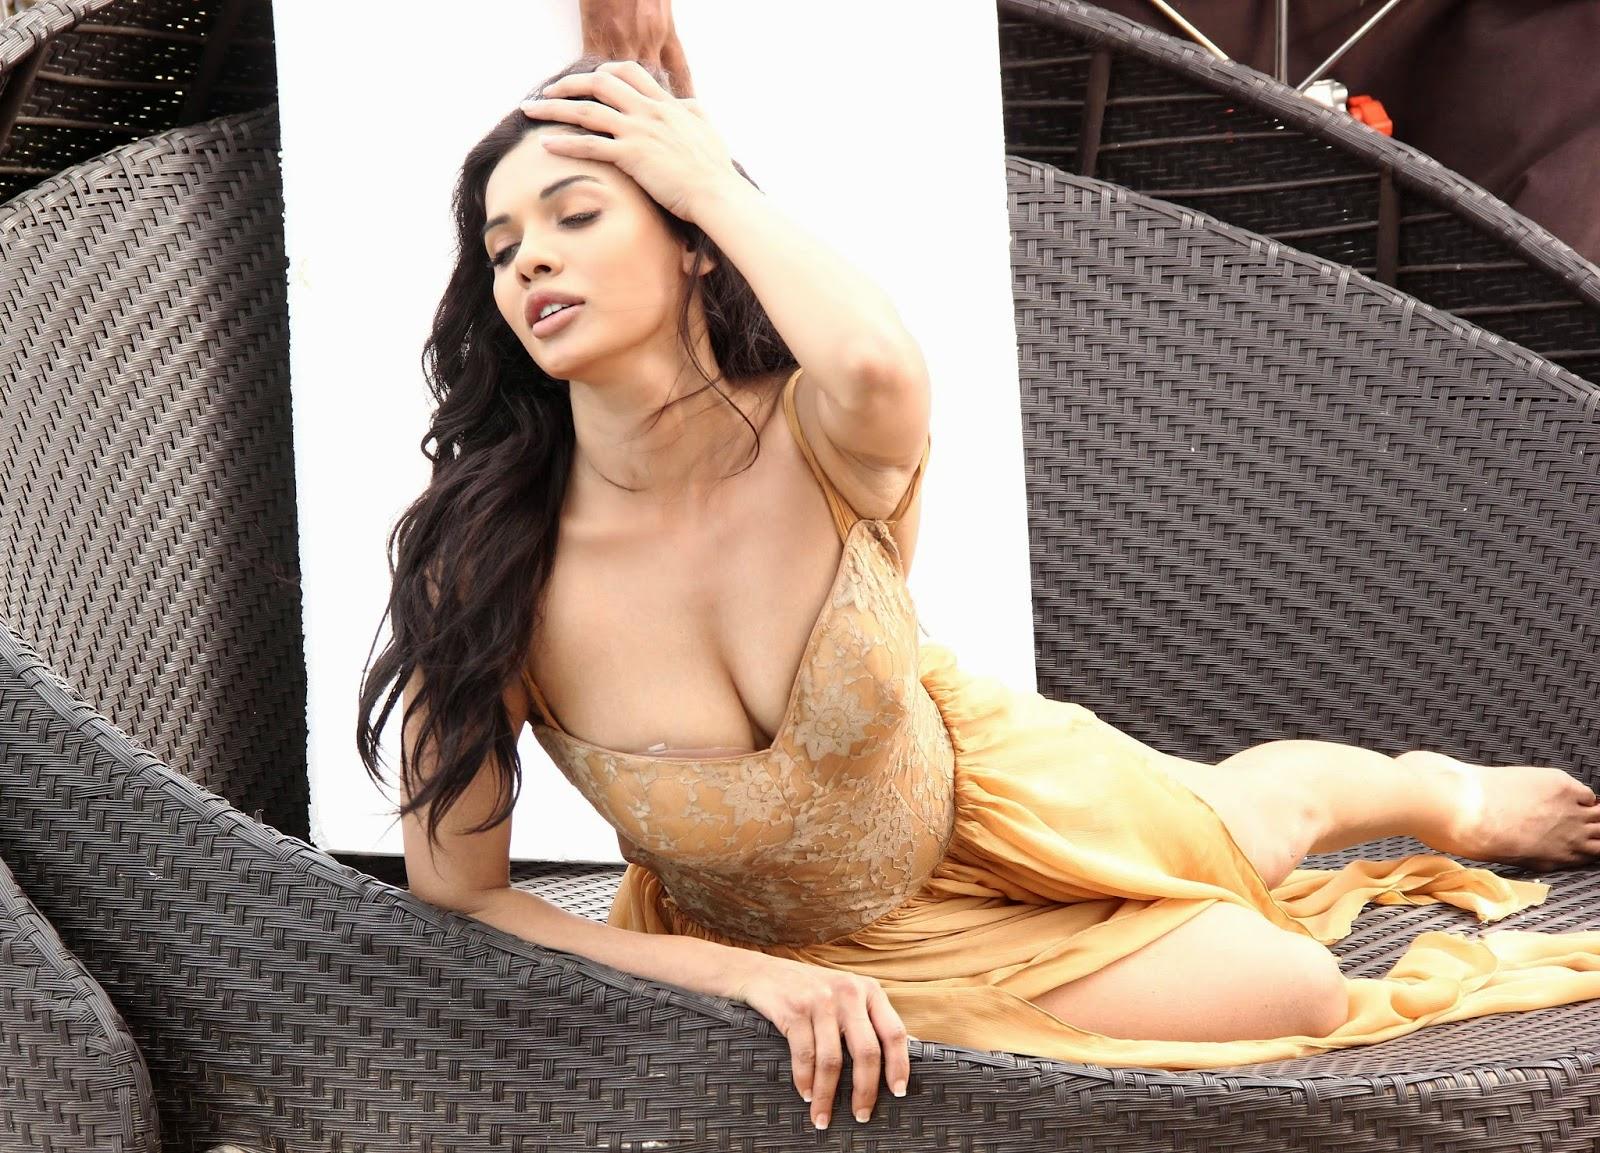 mona lisa pakistani actress naked - at 9:53 AM